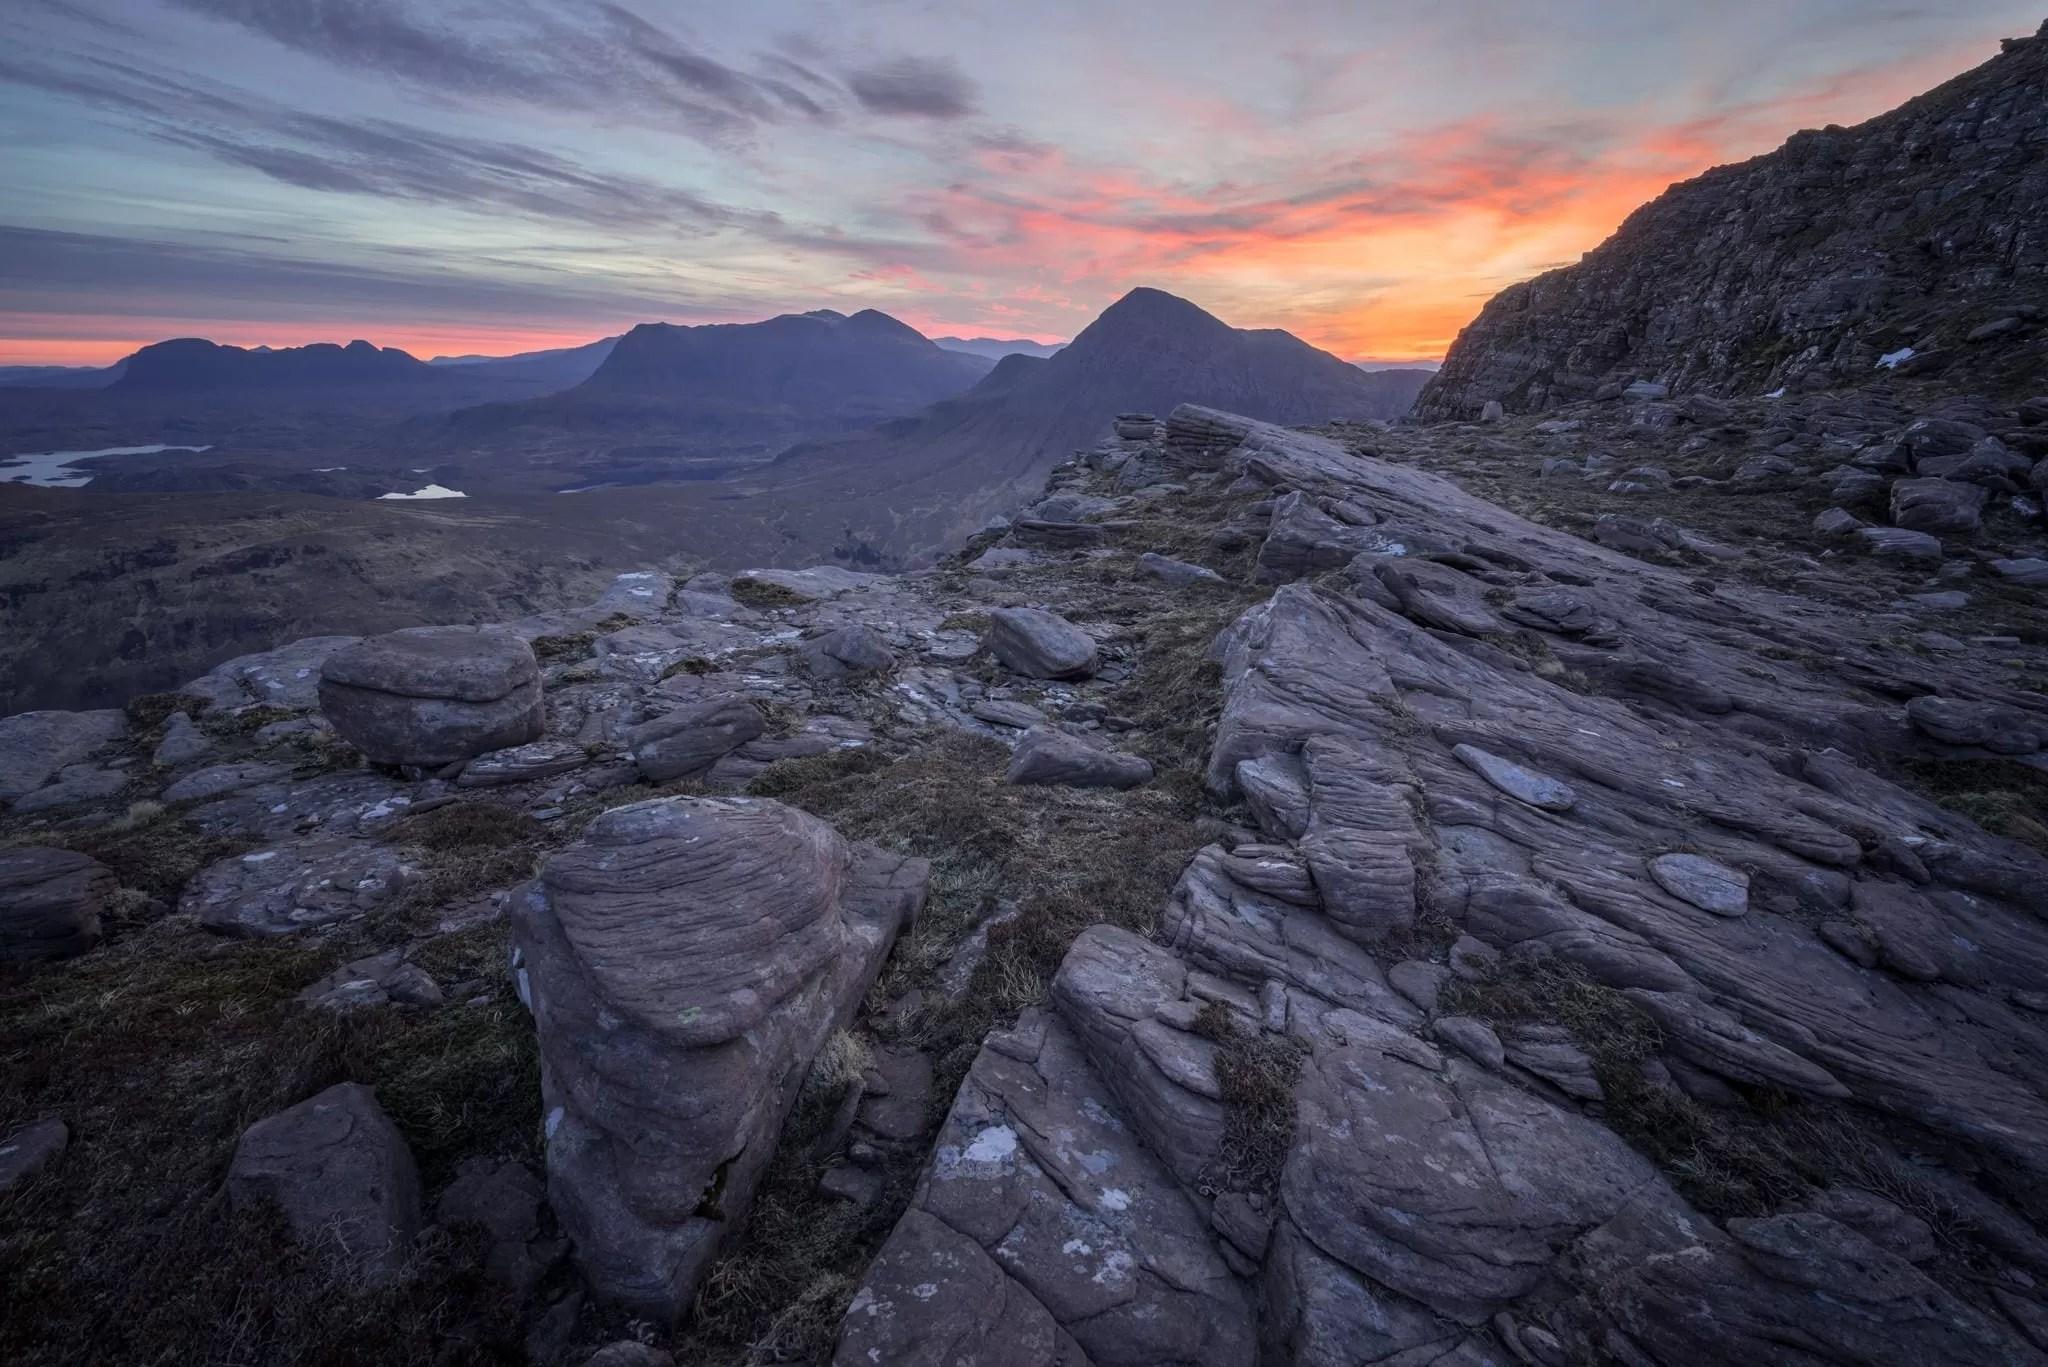 Sgorr Tuath Dawn - Scotland Photography Workshops